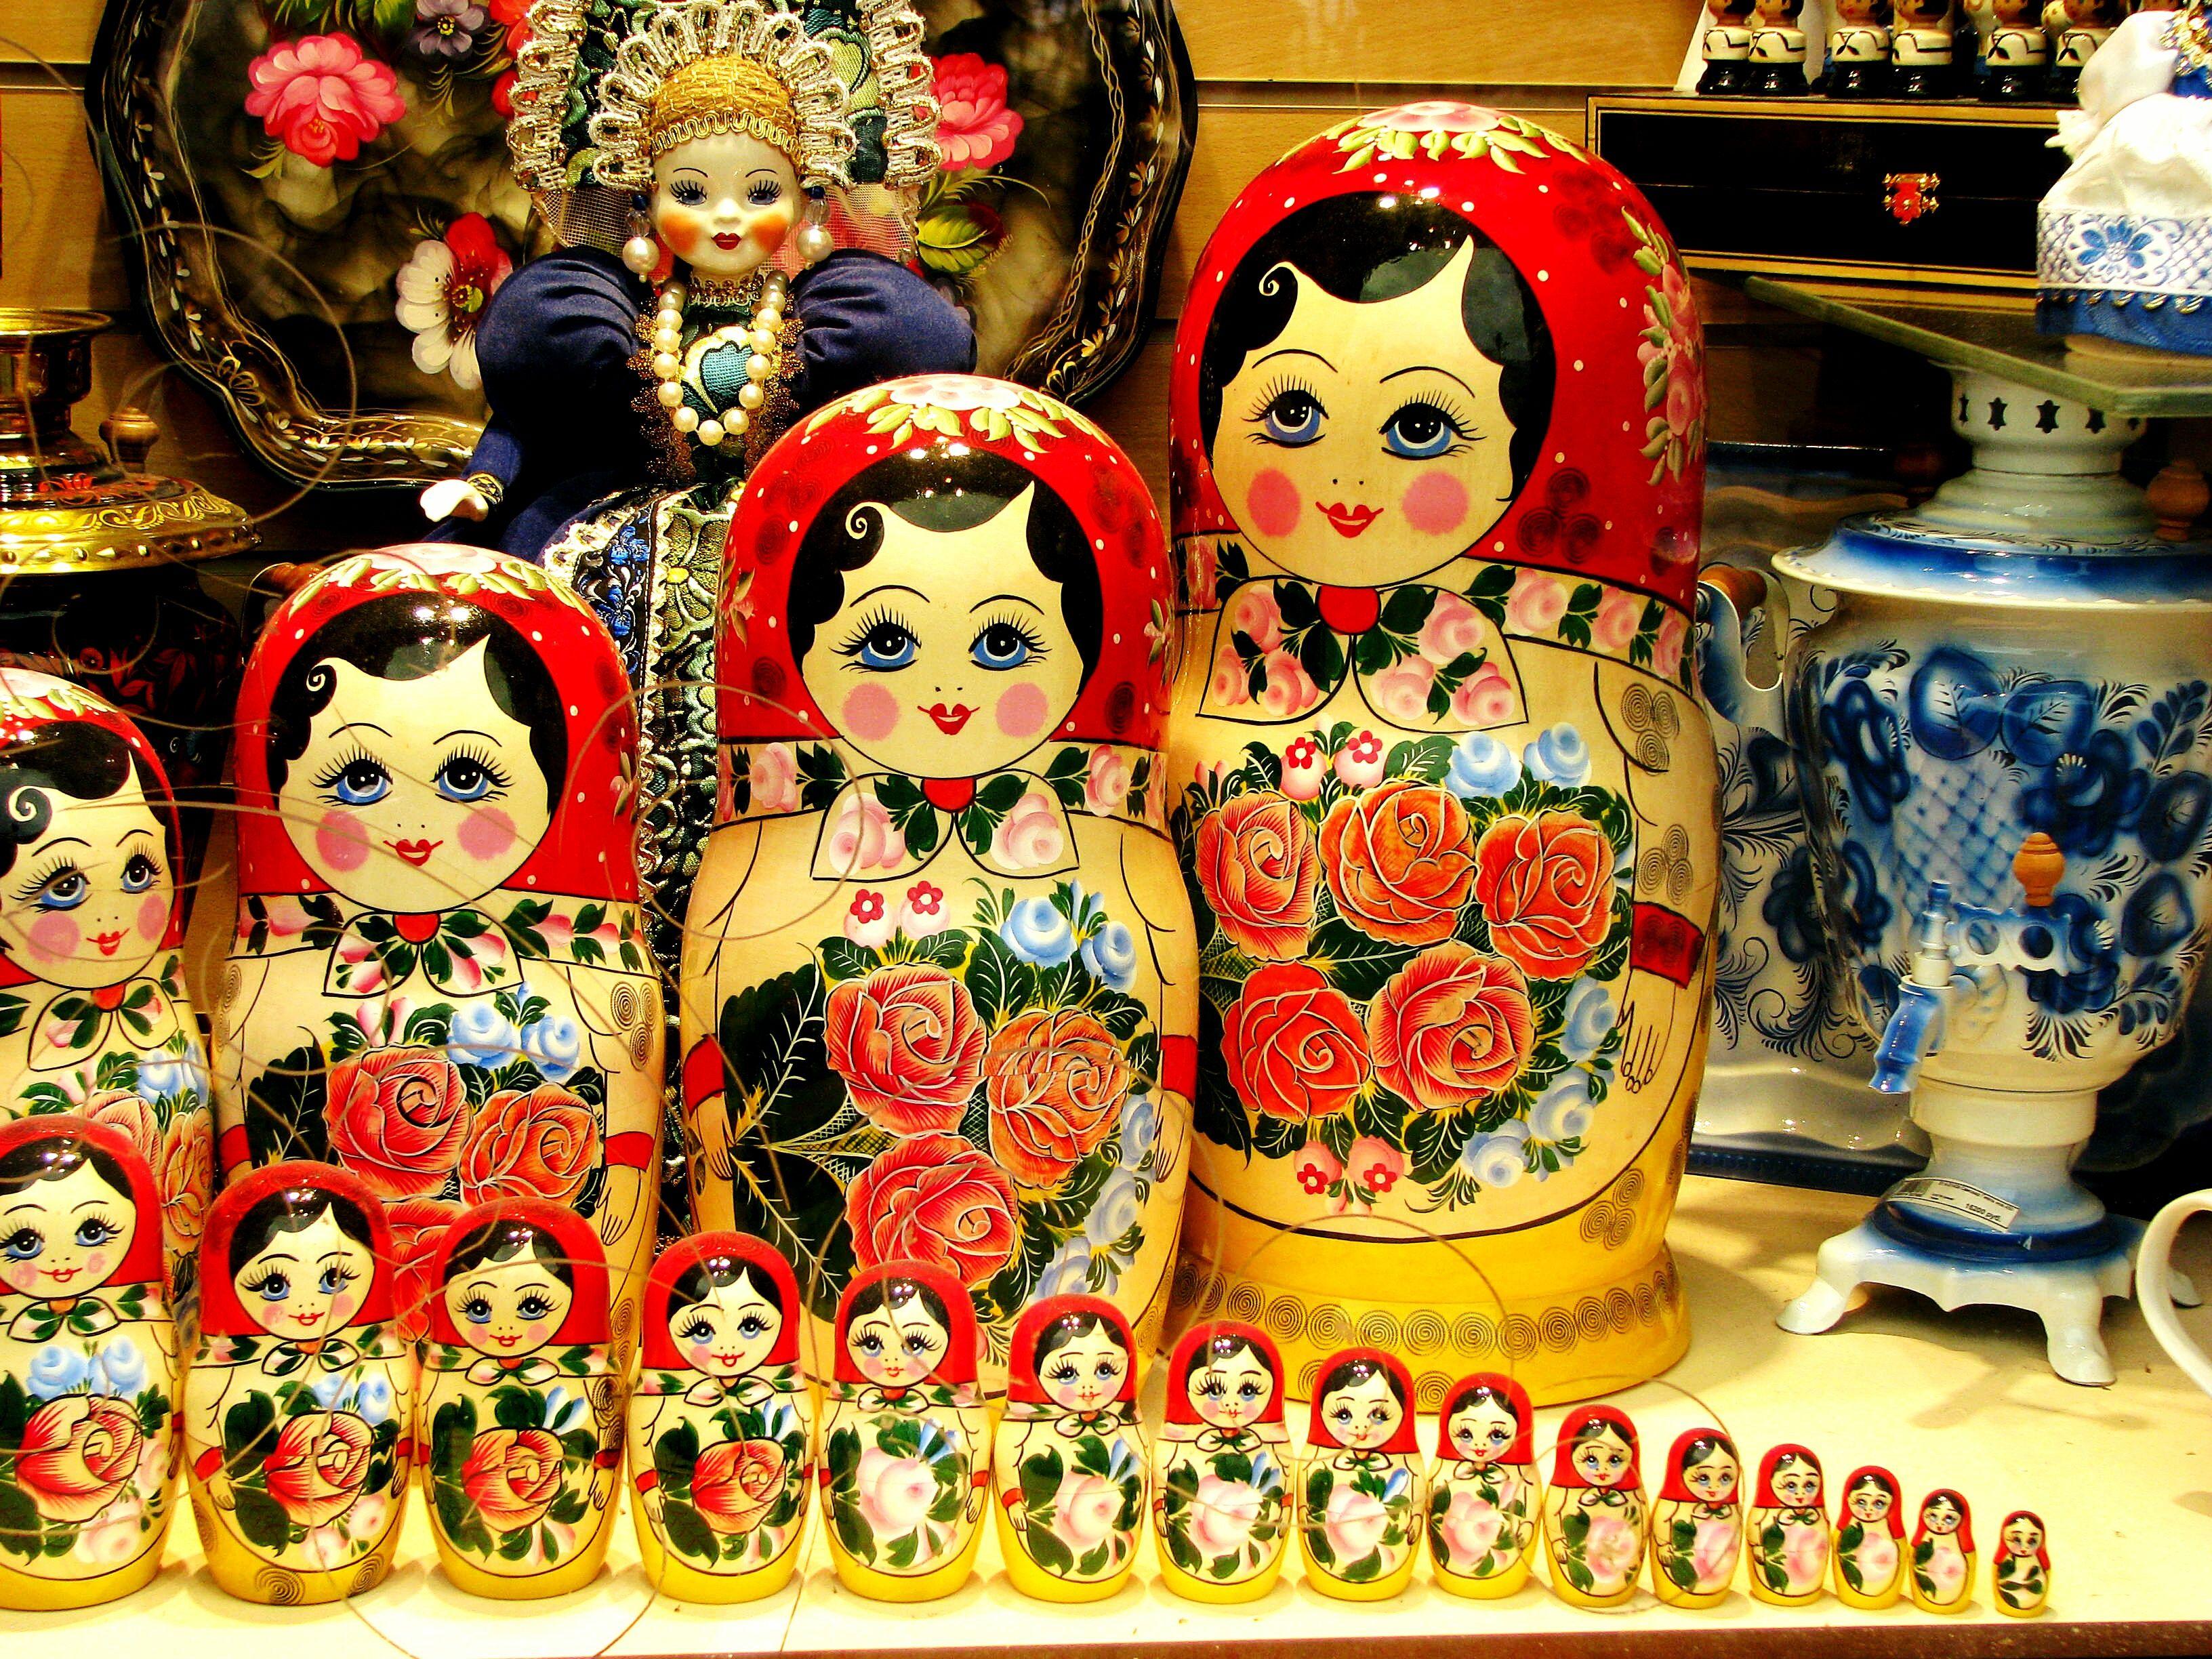 Matryoshka Dolls Arranged On Table At Shop